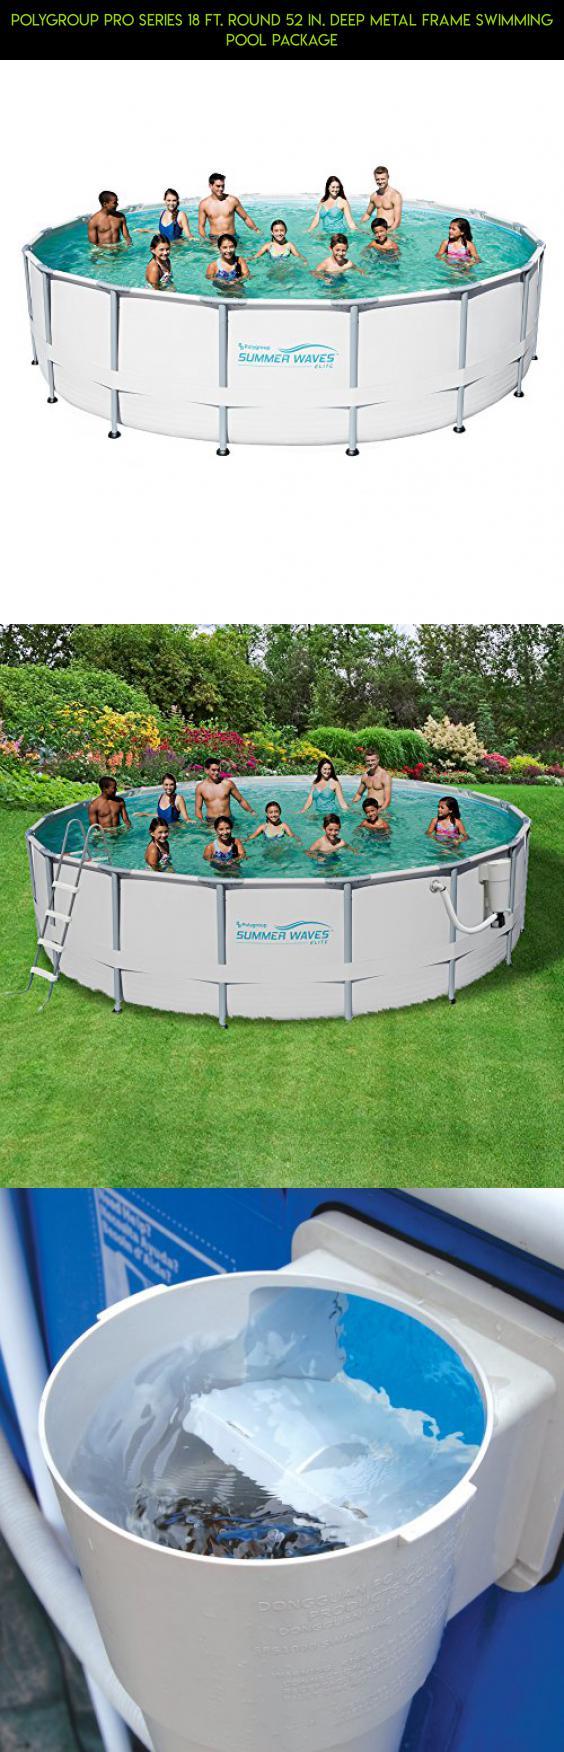 Atemberaubend 15 Ft Metallrahmen Pool Fotos - Benutzerdefinierte ...